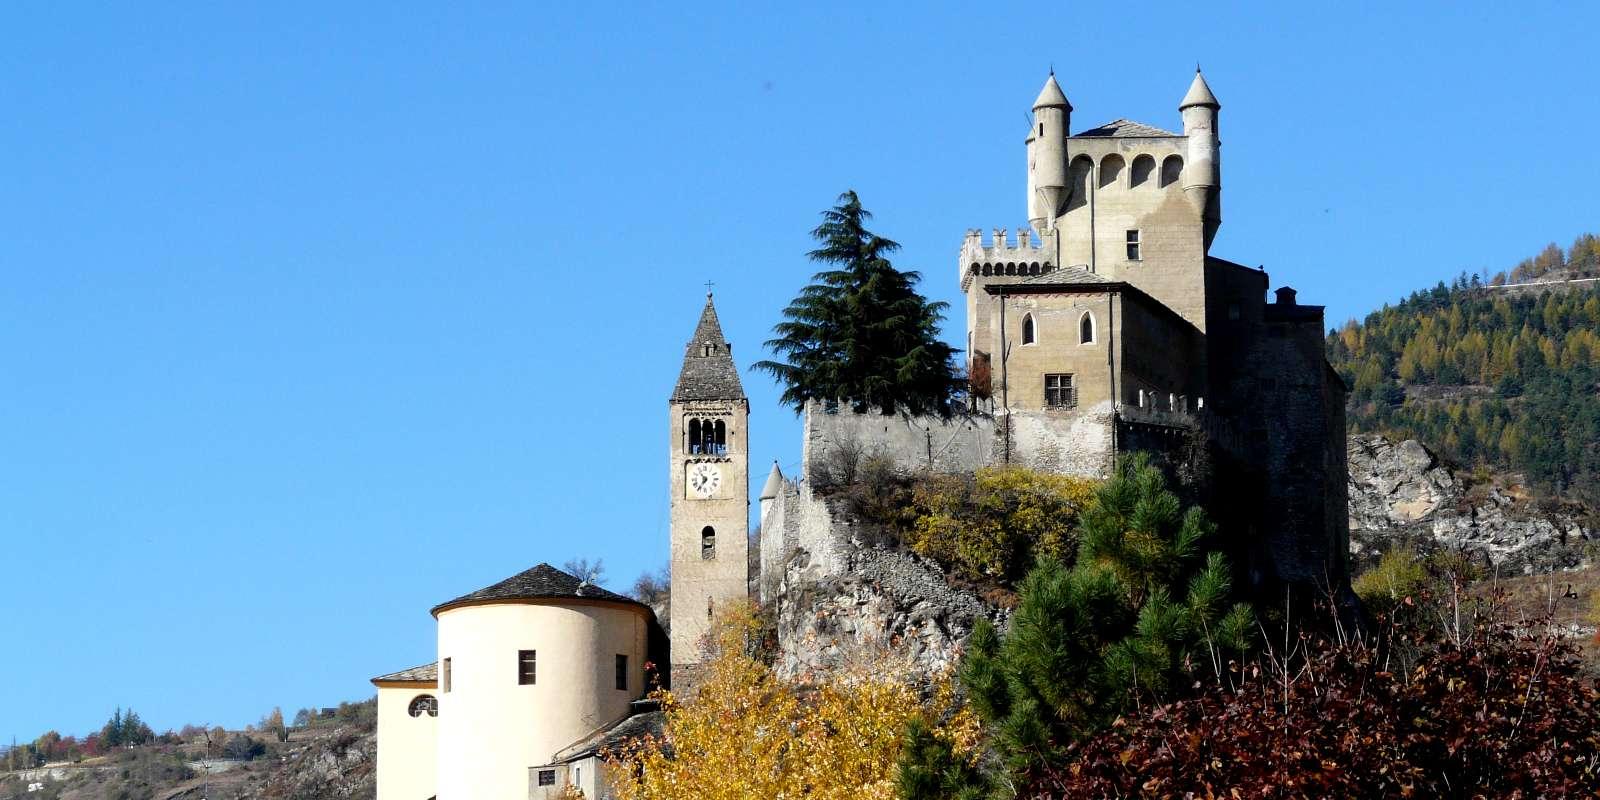 Castello Saint-Pierre